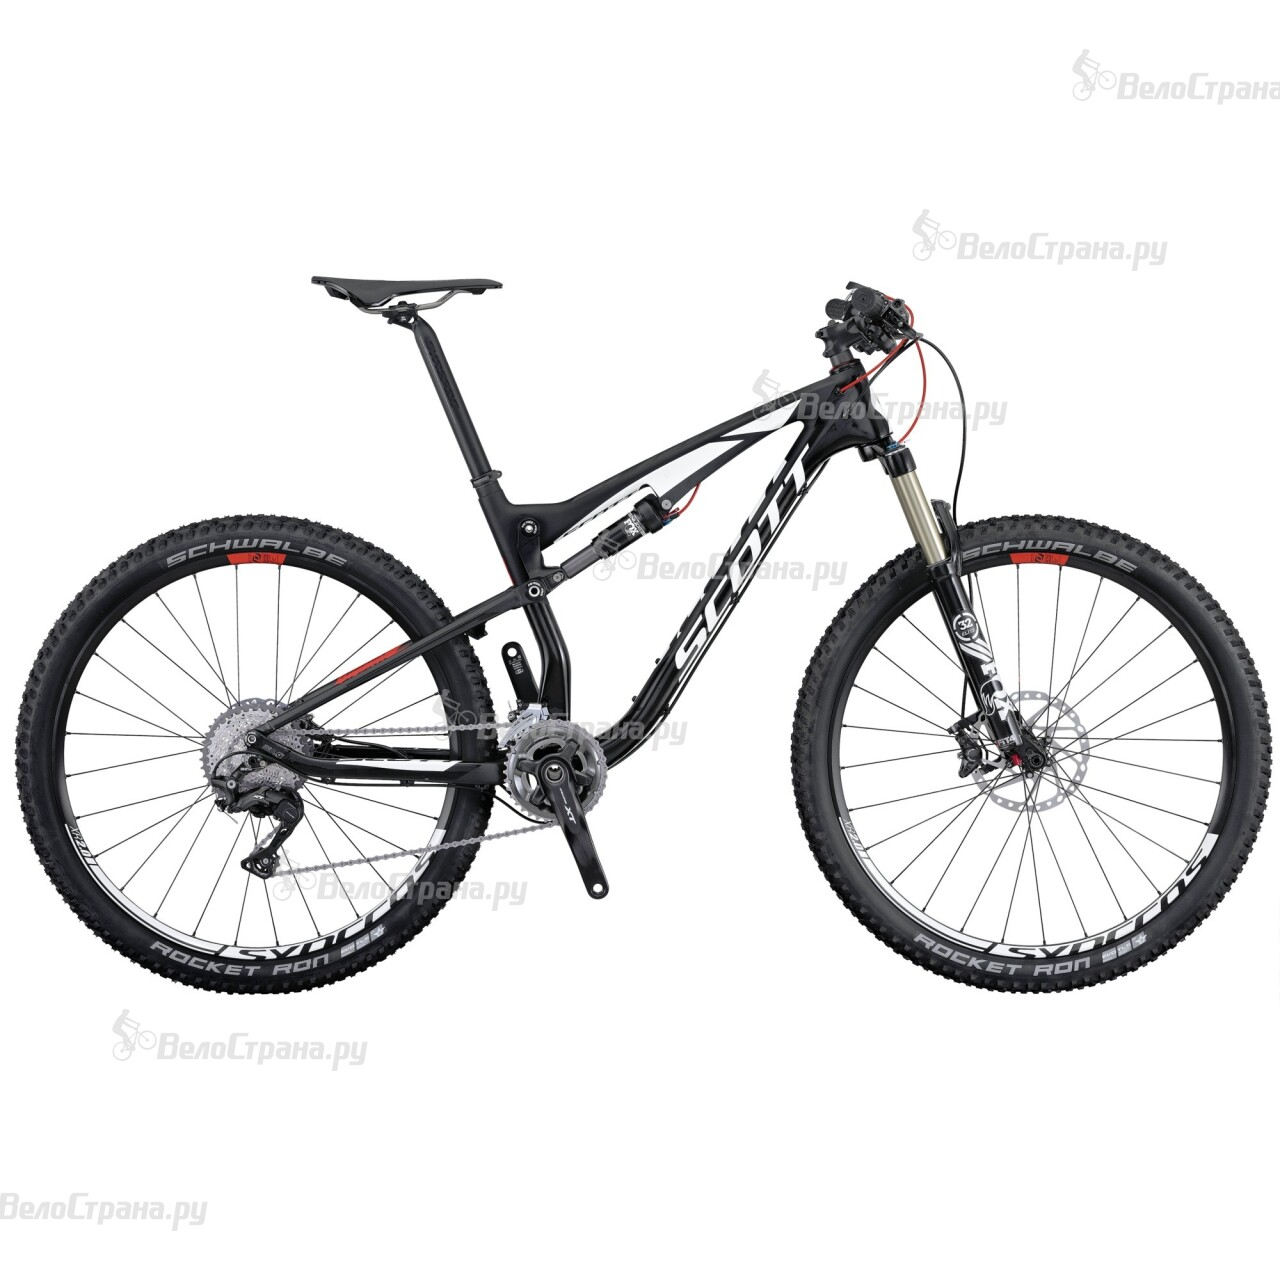 Велосипед Scott Spark 710 (2016)